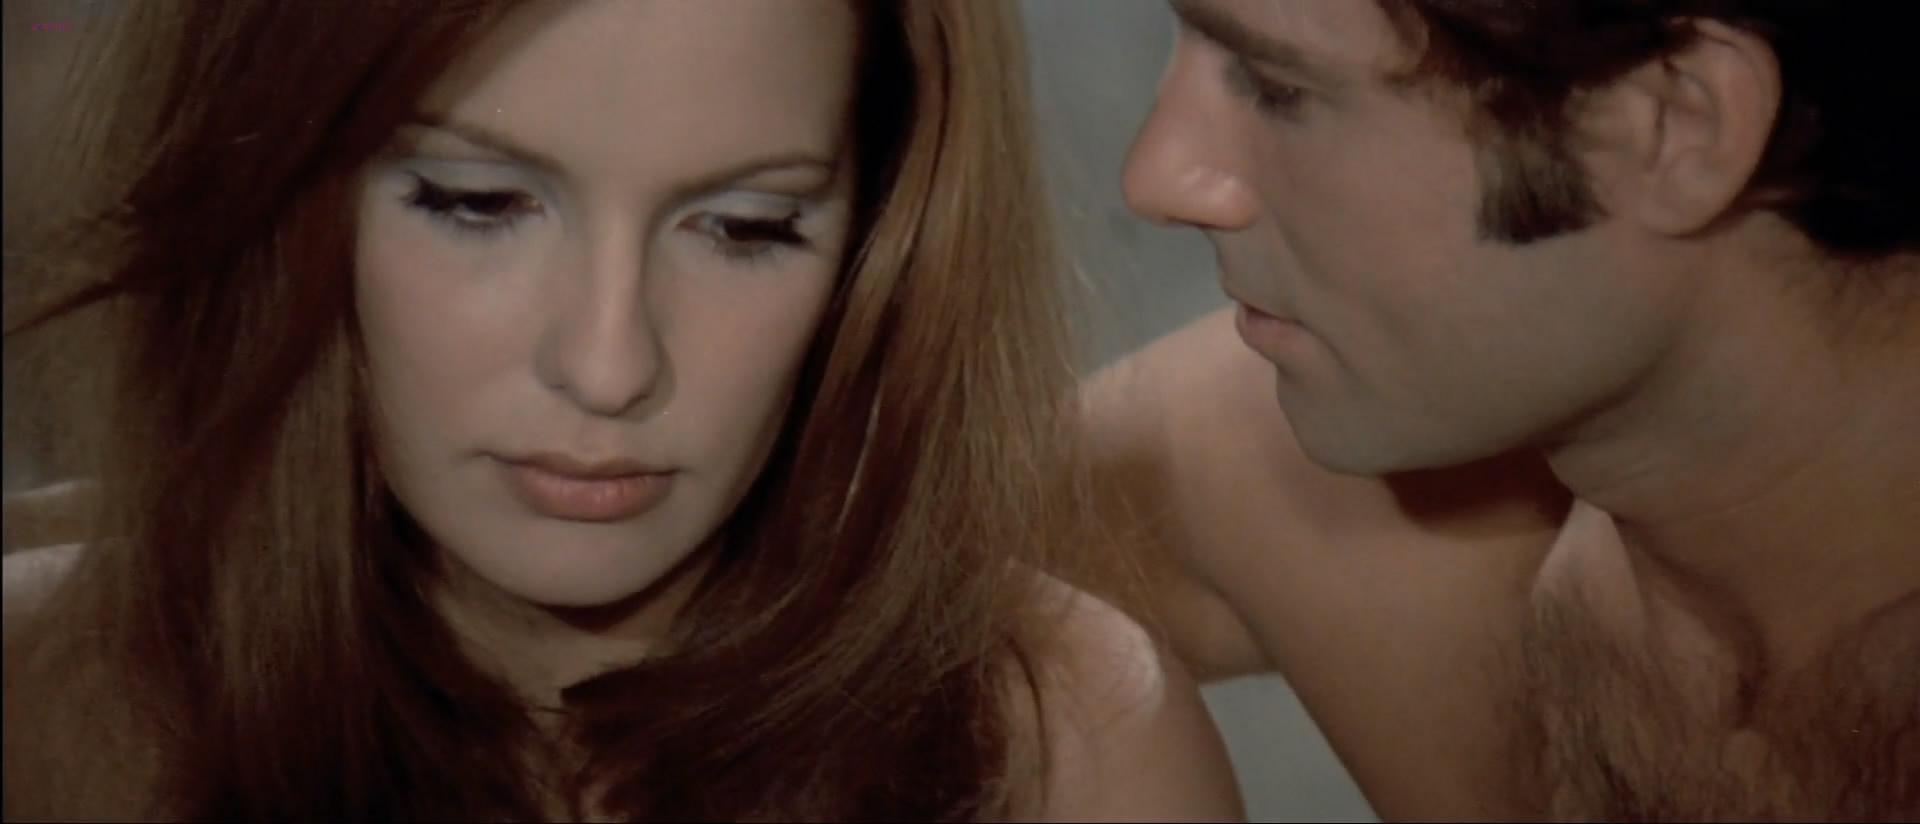 miss california nude uncensored